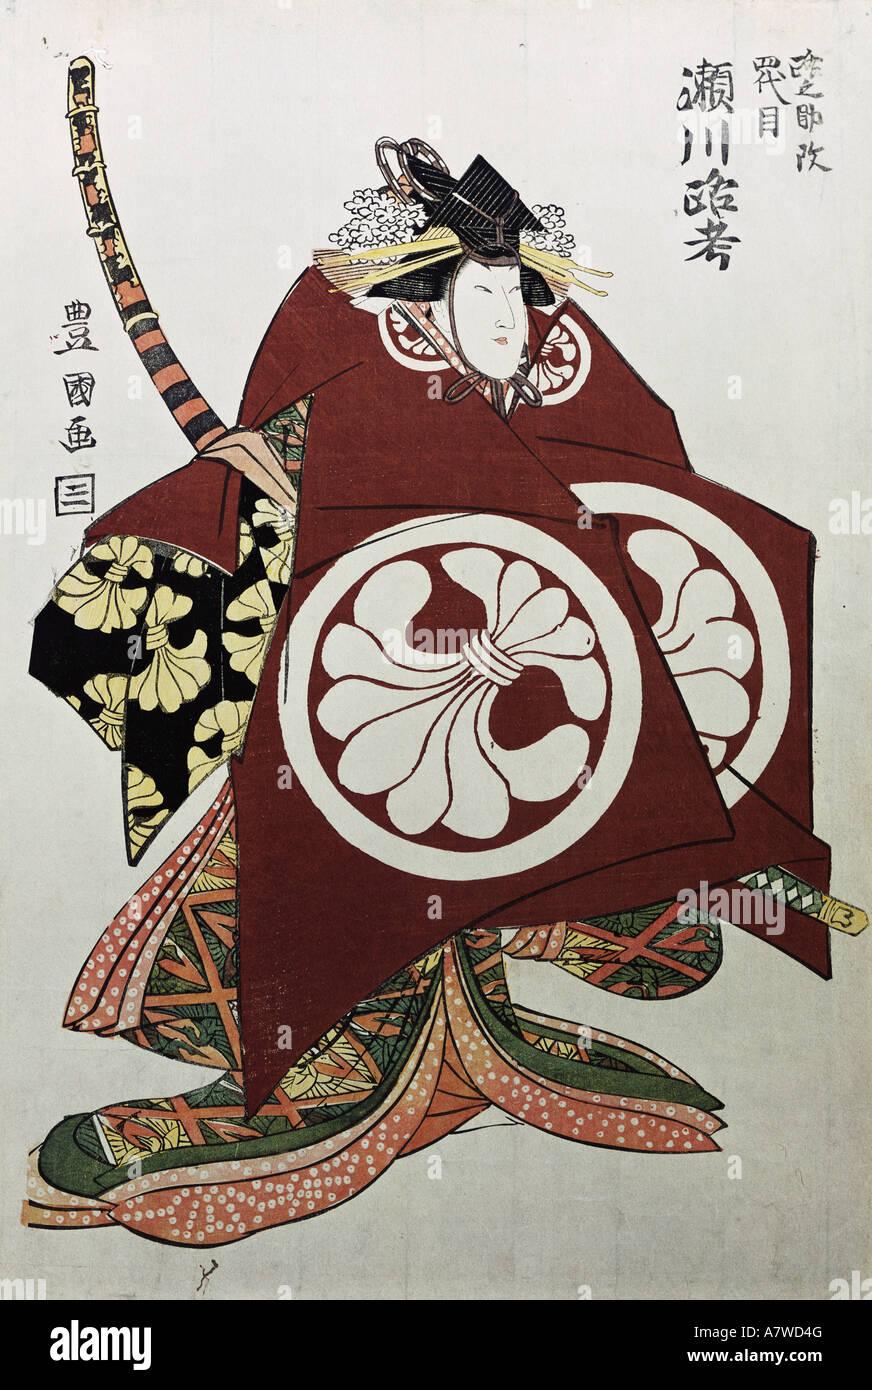 fine arts, Utagawa Tokoyuni (1769 - 1825), actor Segawa Roko IV as Samurai', coloured woodcut, early 18th century, - Stock Image